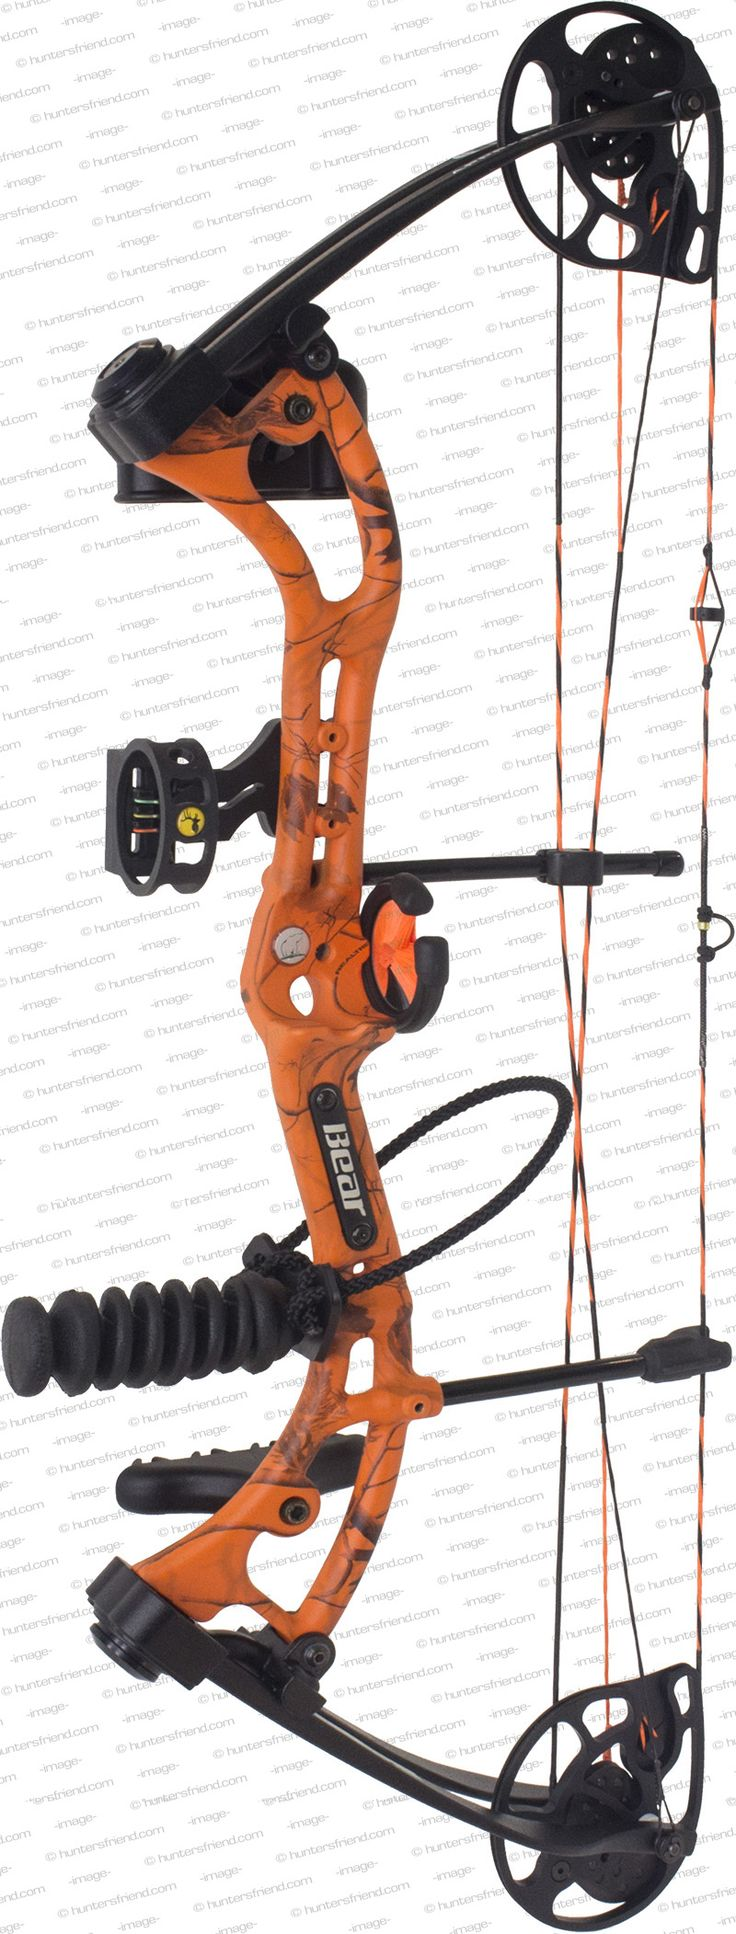 bear apprentice III compound bow kit in orange camo